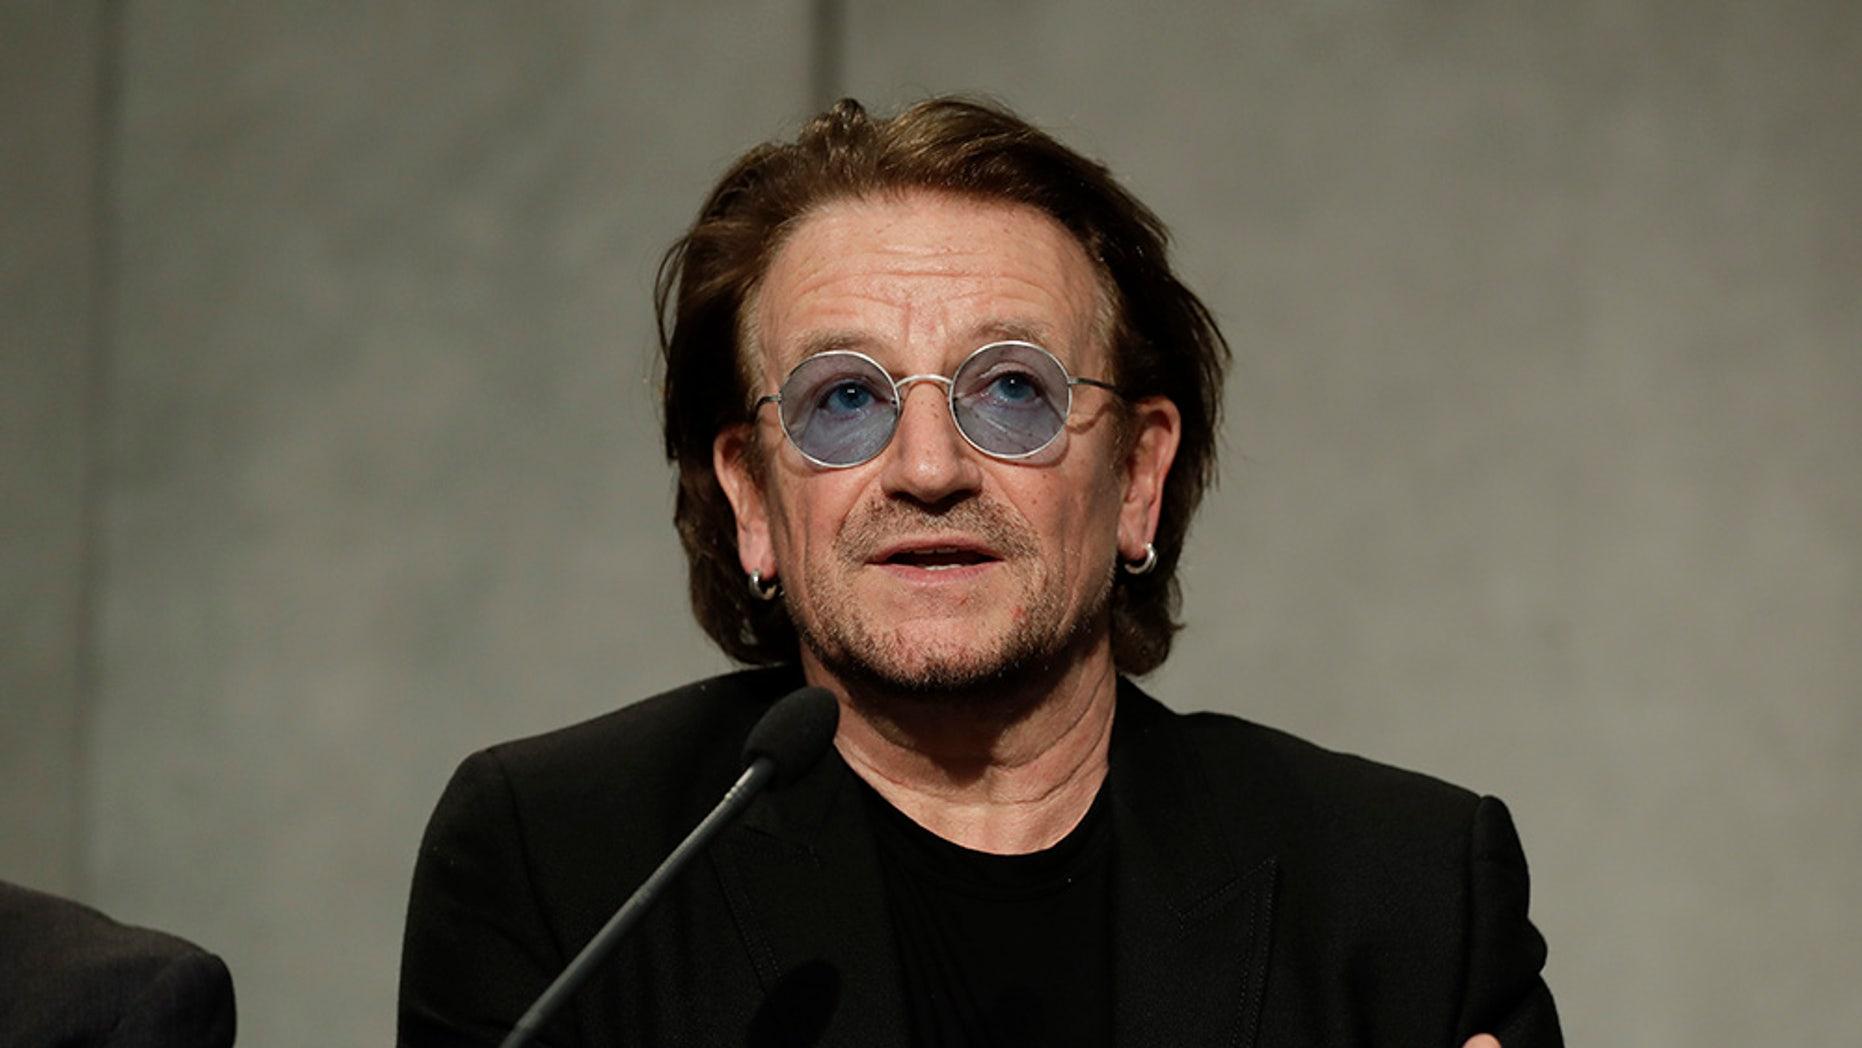 U2 rocker Bono called capitalism 'amoral' at a recent speaking panel.